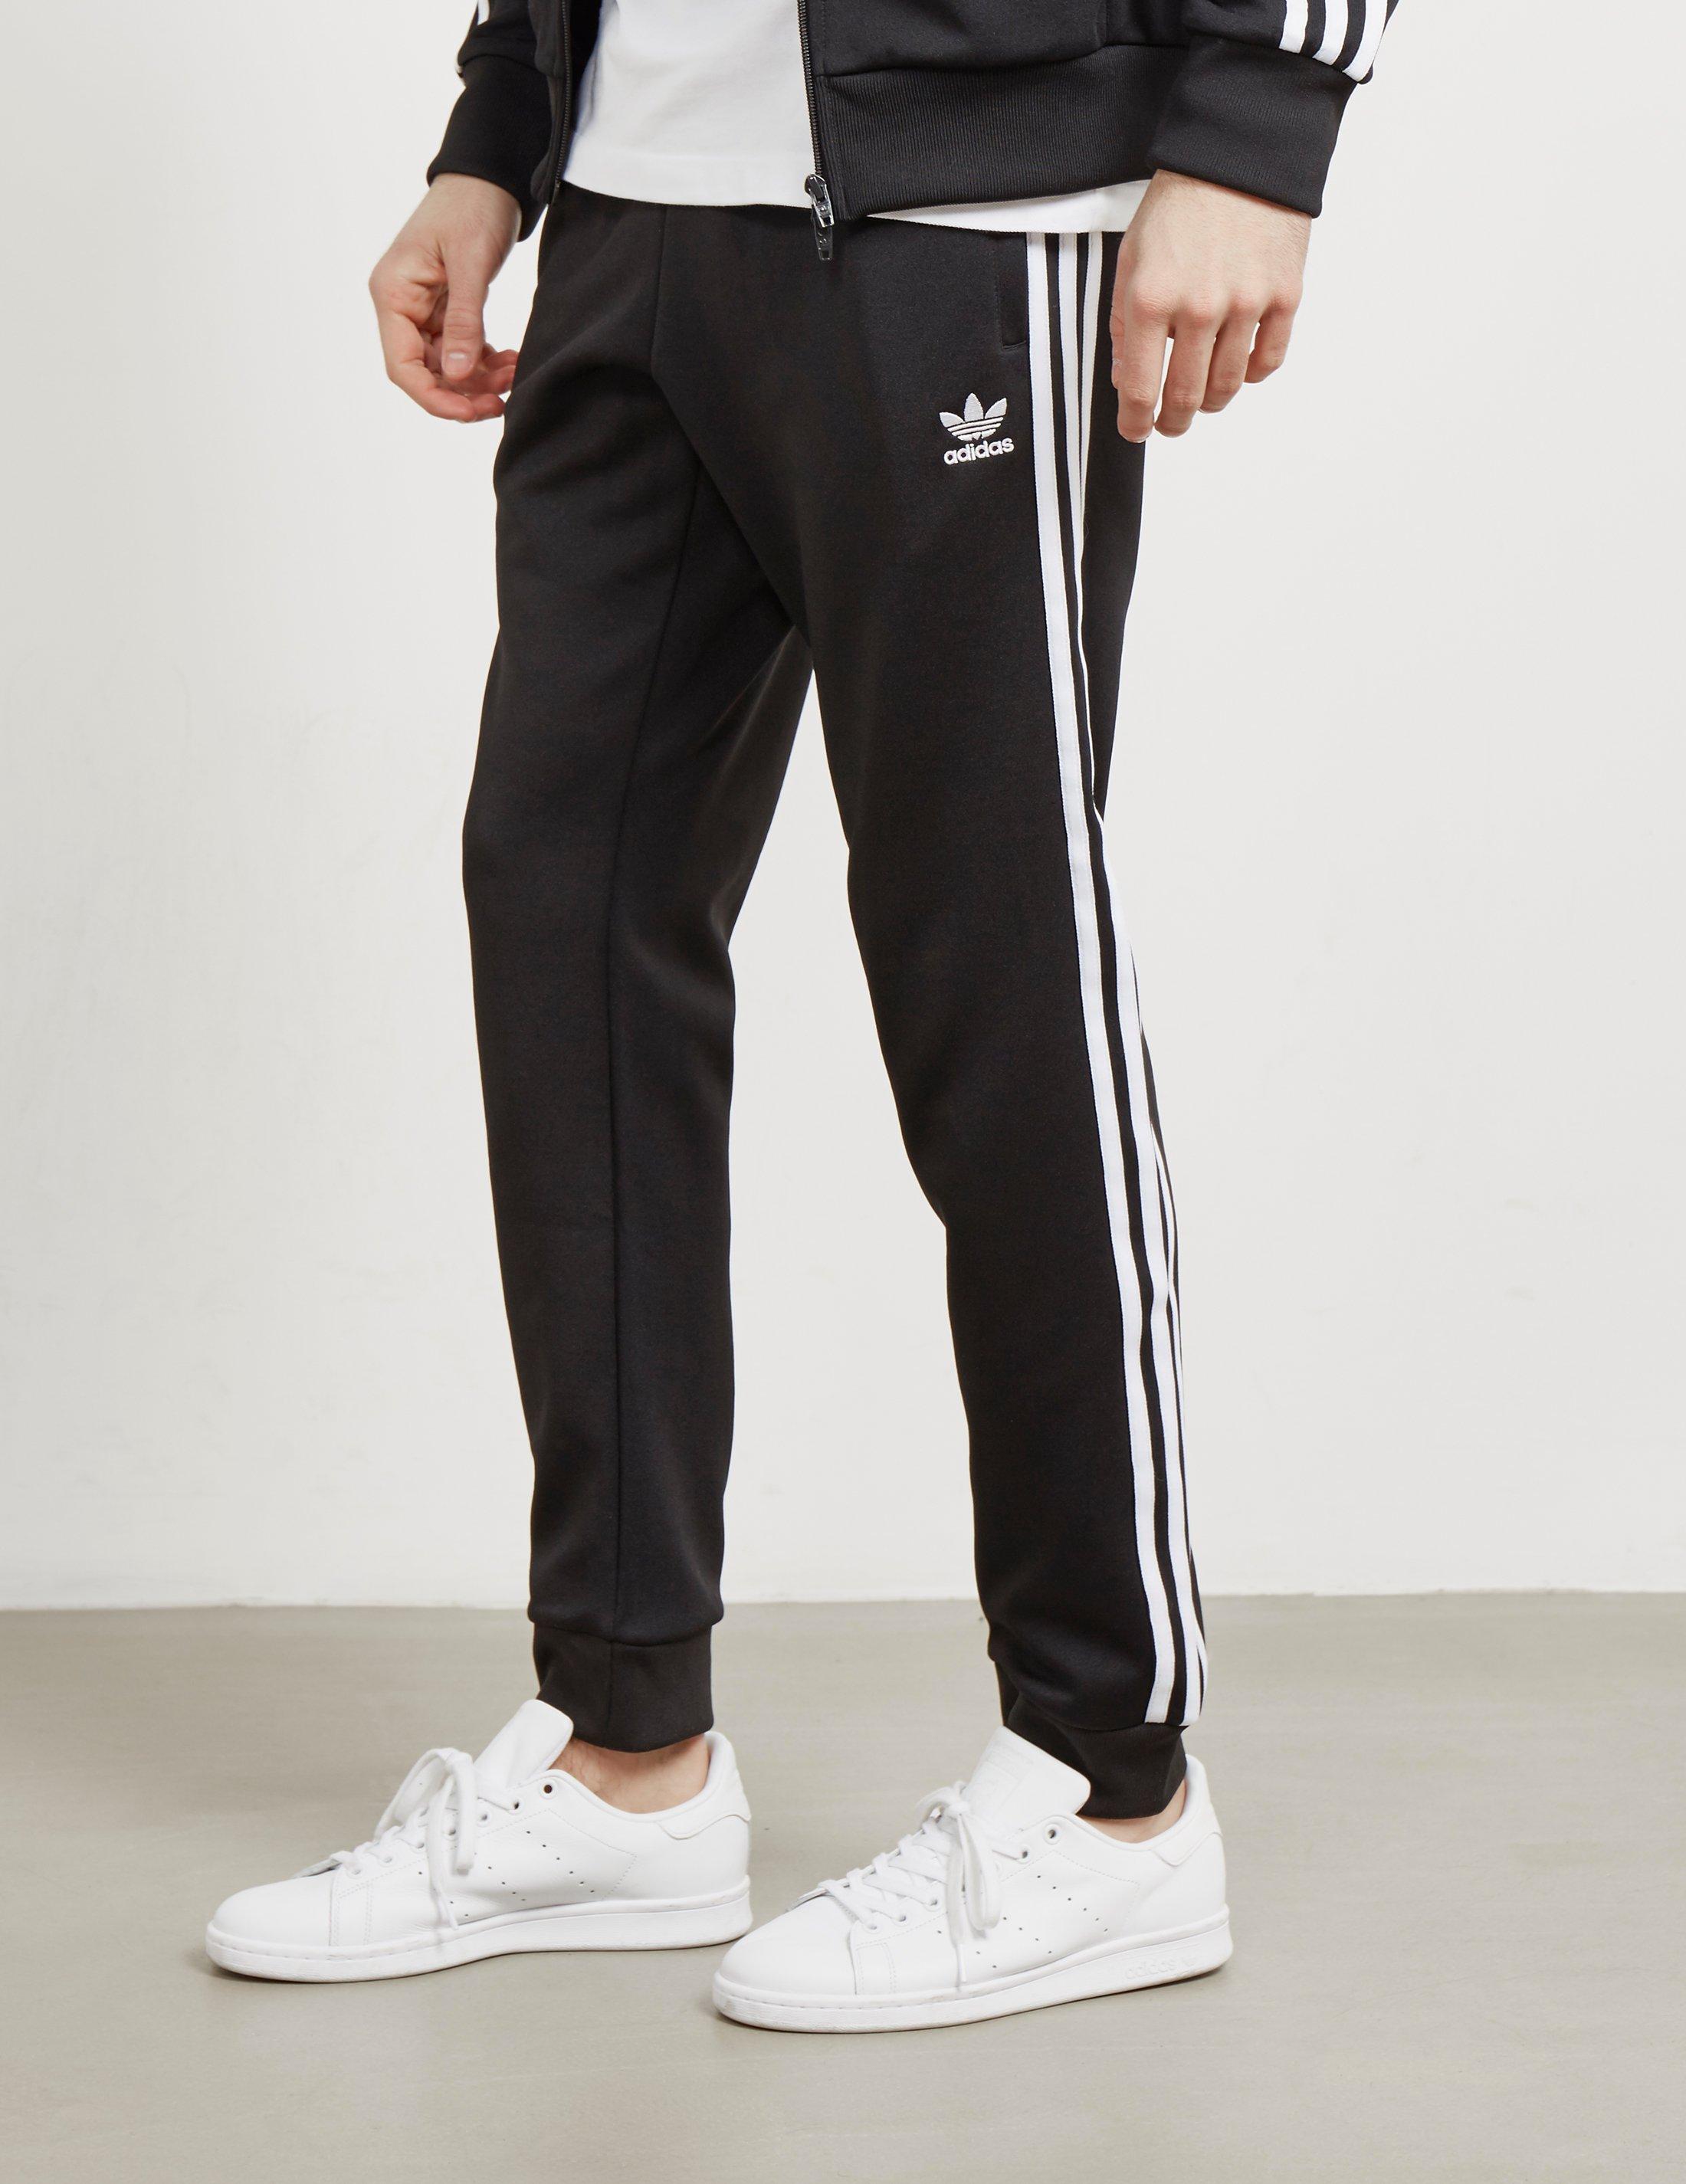 uk availability 03f3f 4075a Lyst - adidas Originals Mens Superstar Cuffed Track Pants Black in ...